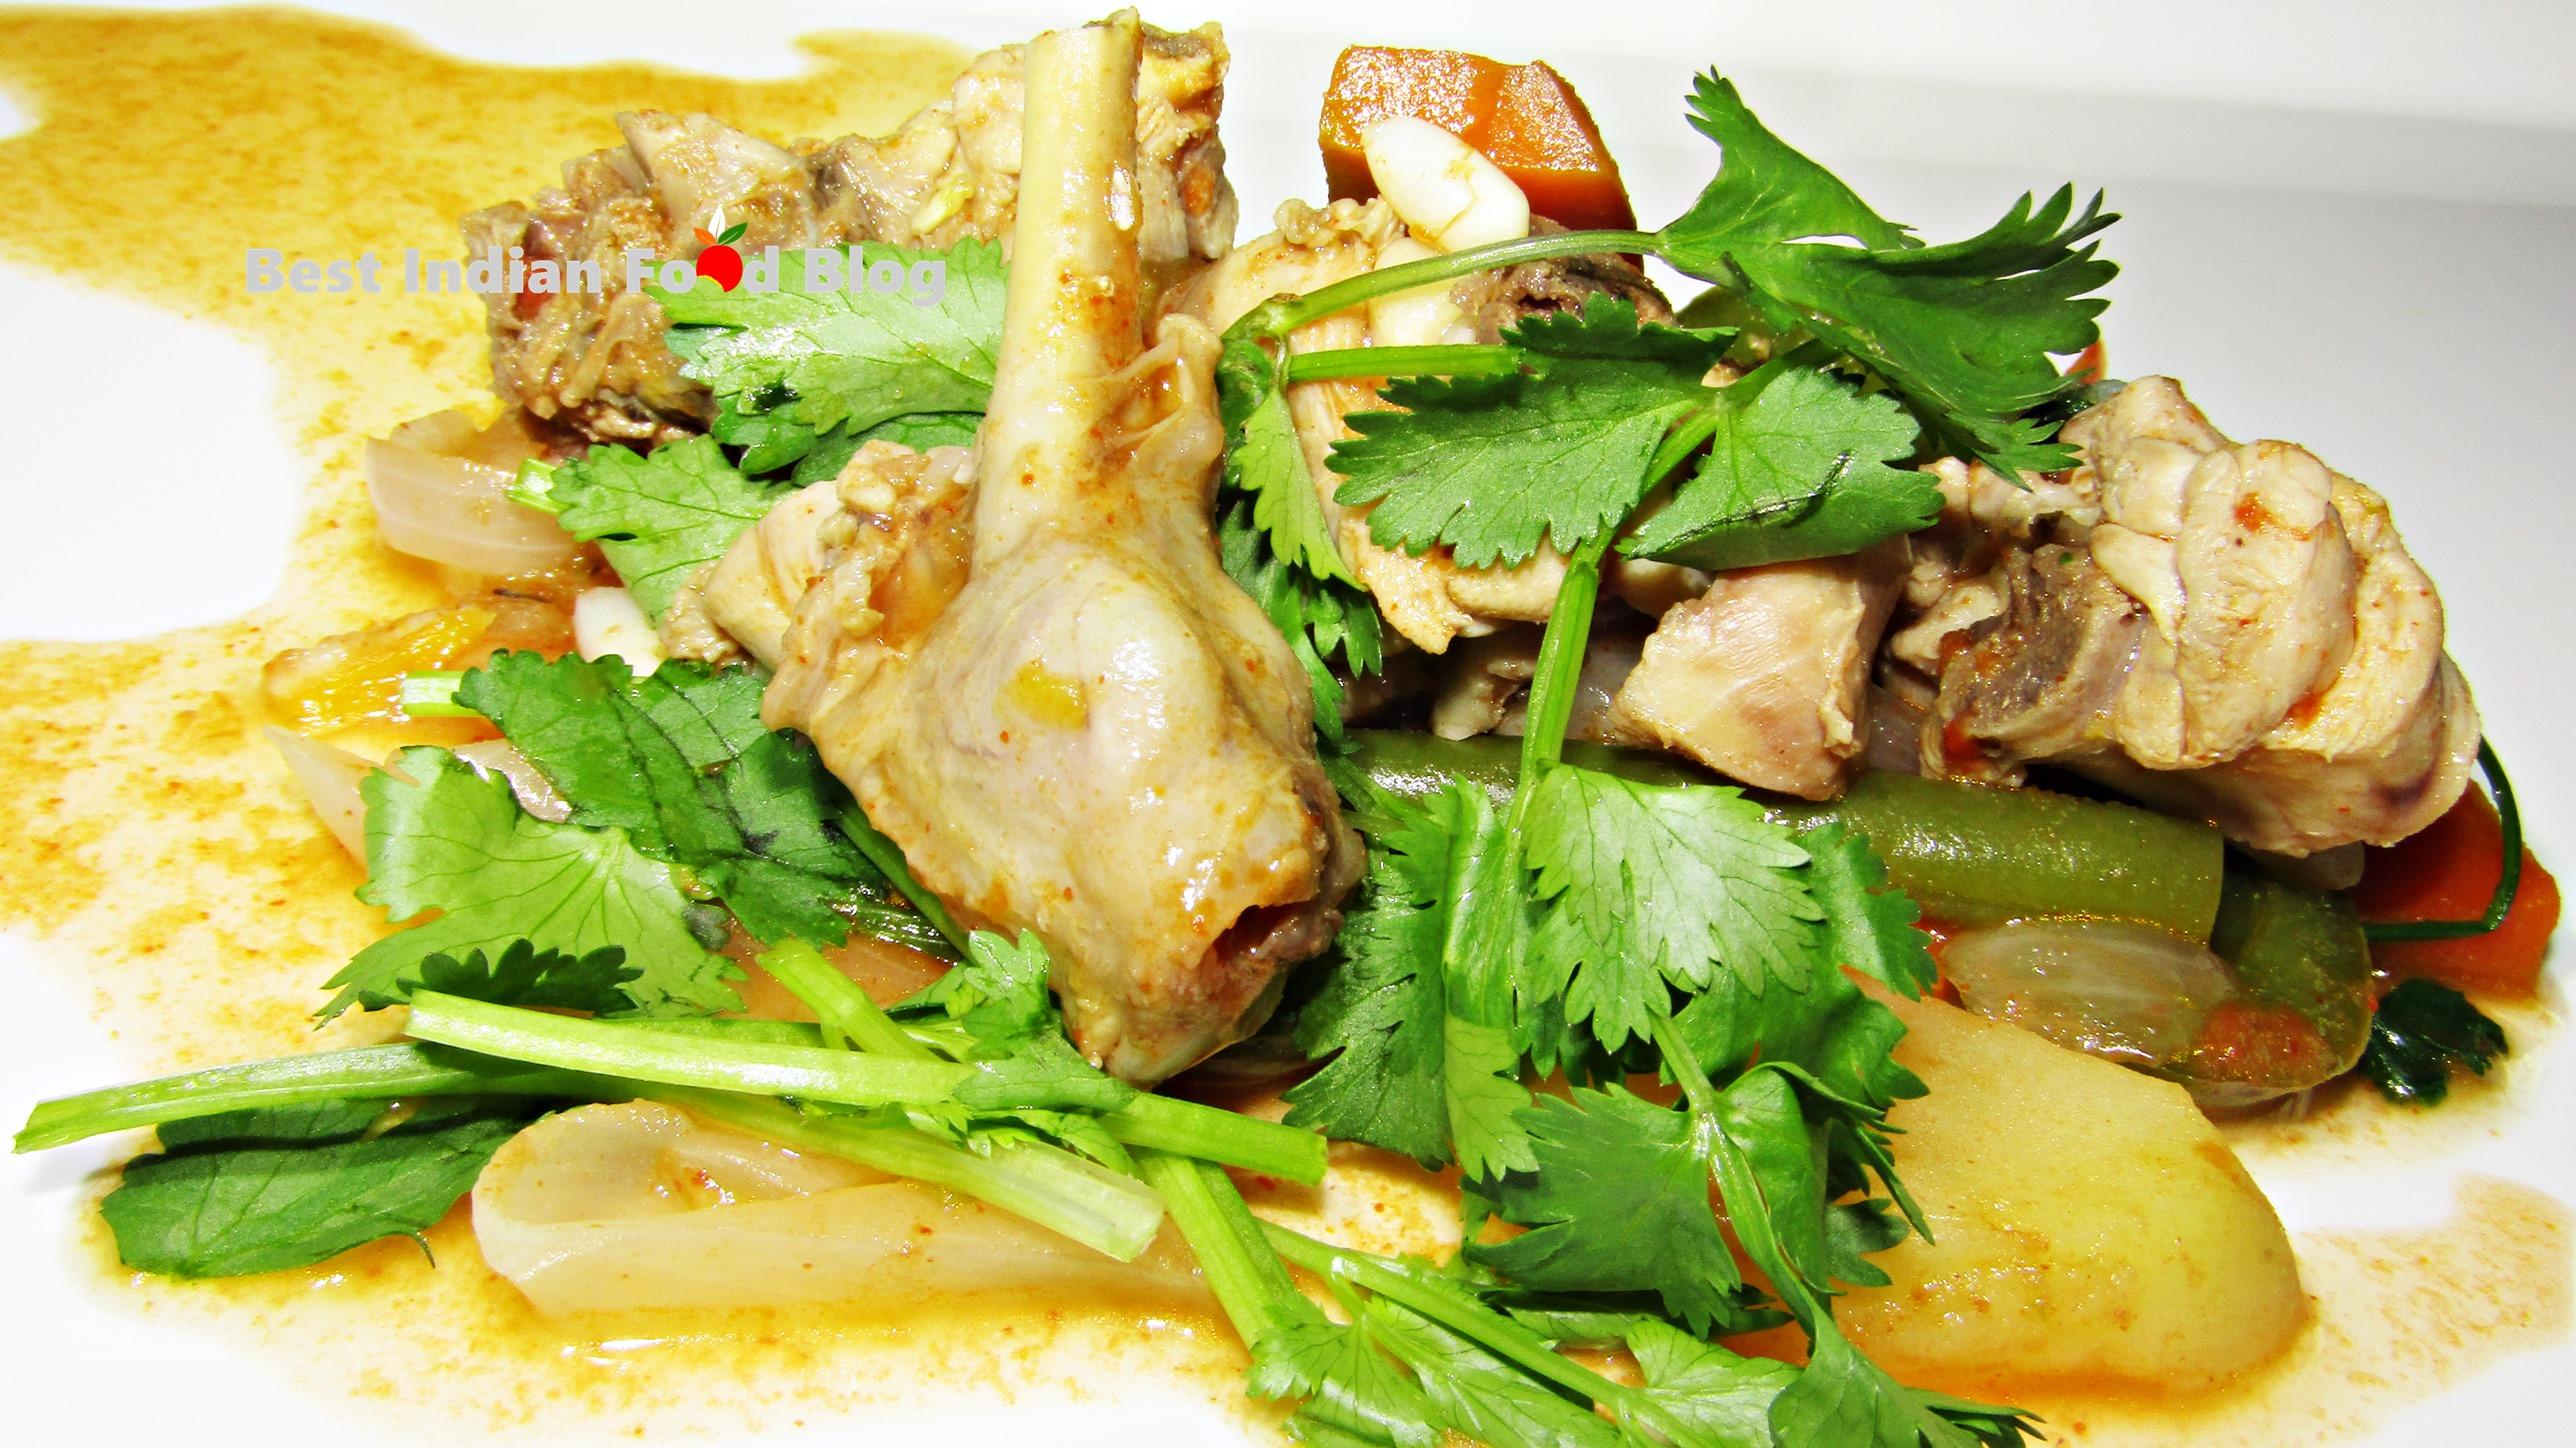 Yen Kangsoi from Manipur, India | Best Indian Food Blog | Chicken recipe